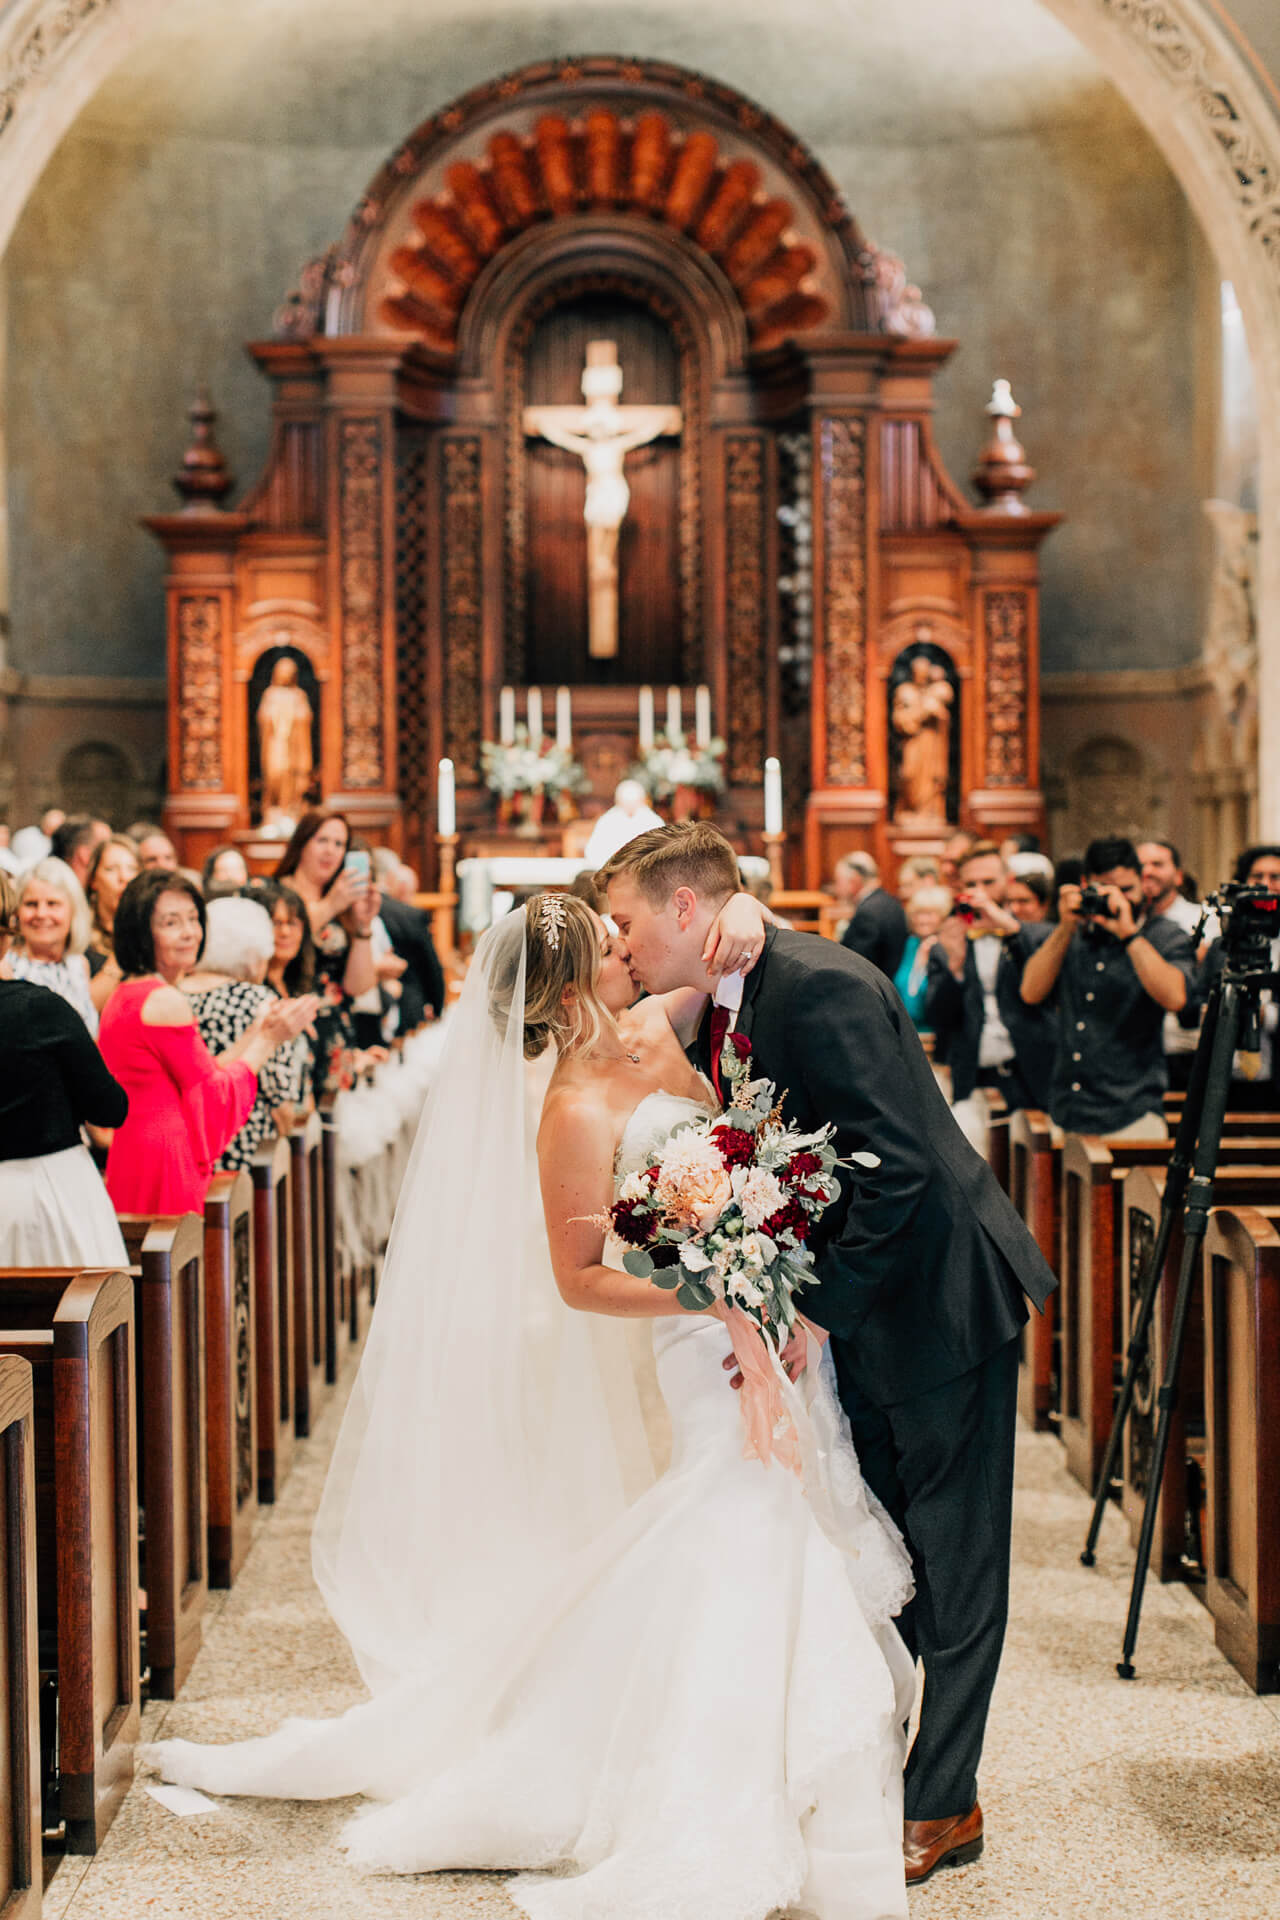 mcdevitt grady wedding at st. charles borromeo church